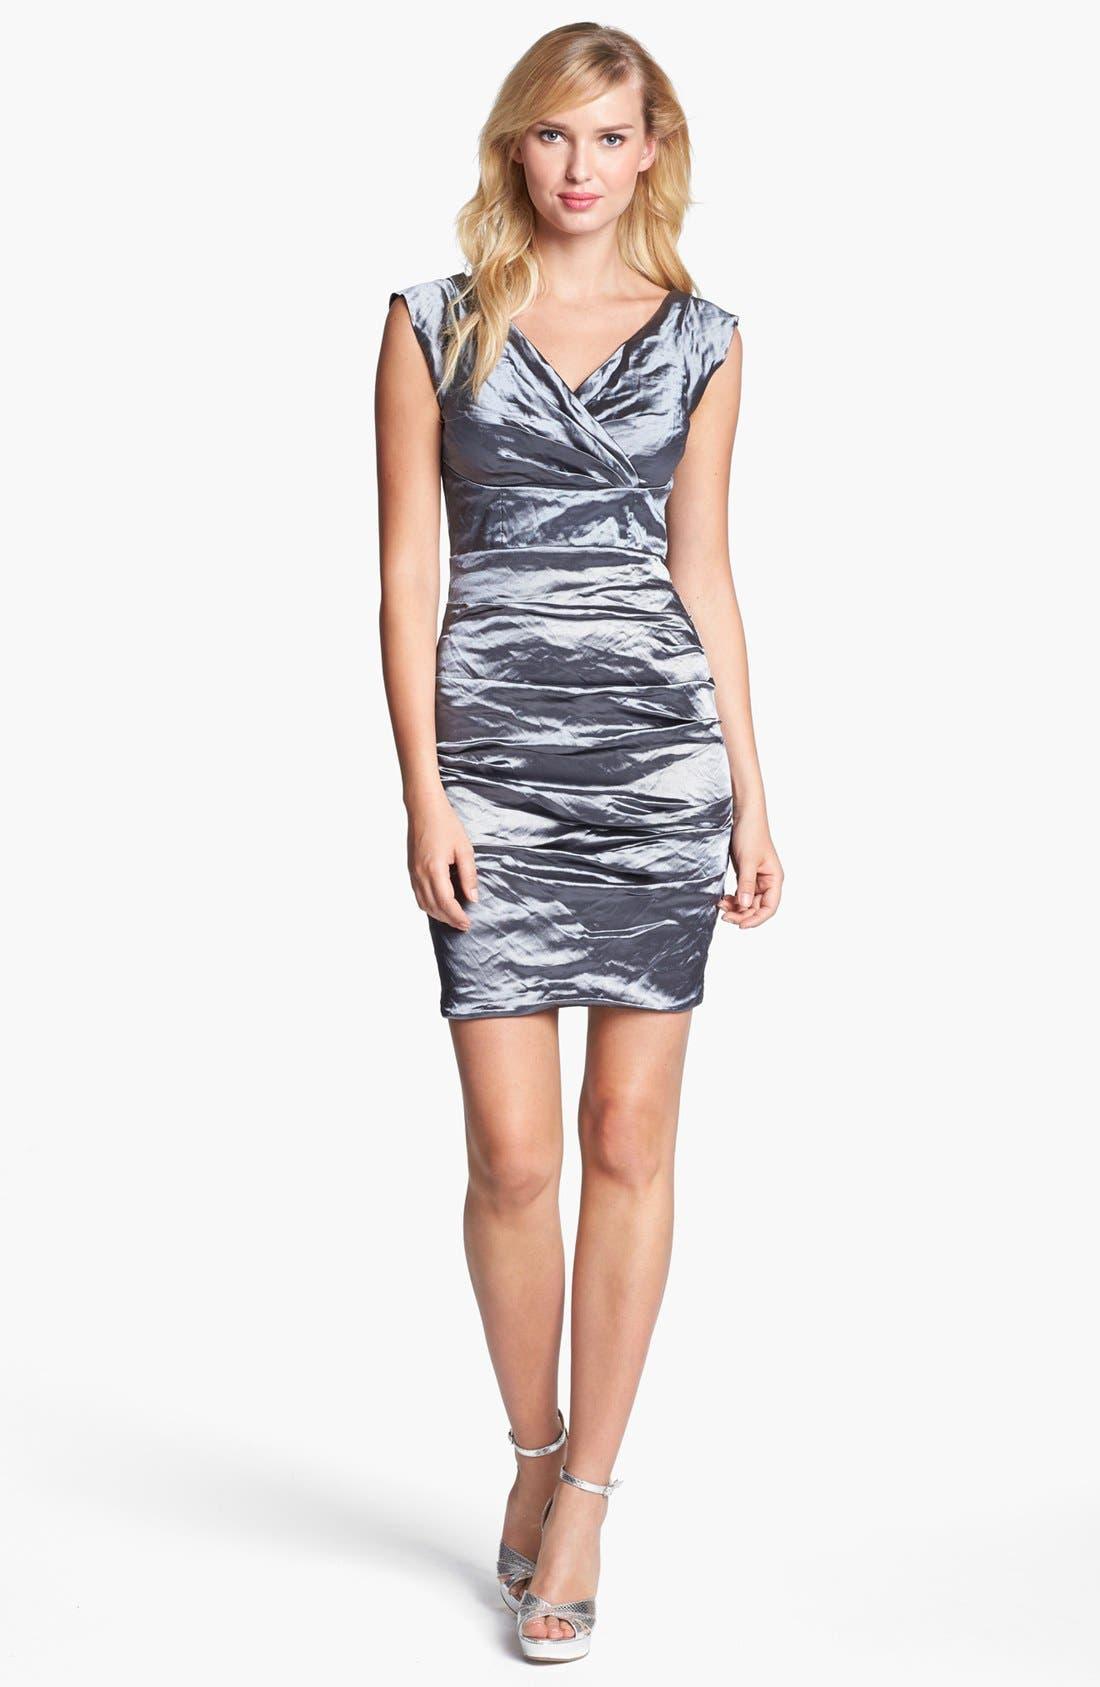 Alternate Image 1 Selected - Nicole Miller Techno Metal Textured Dress